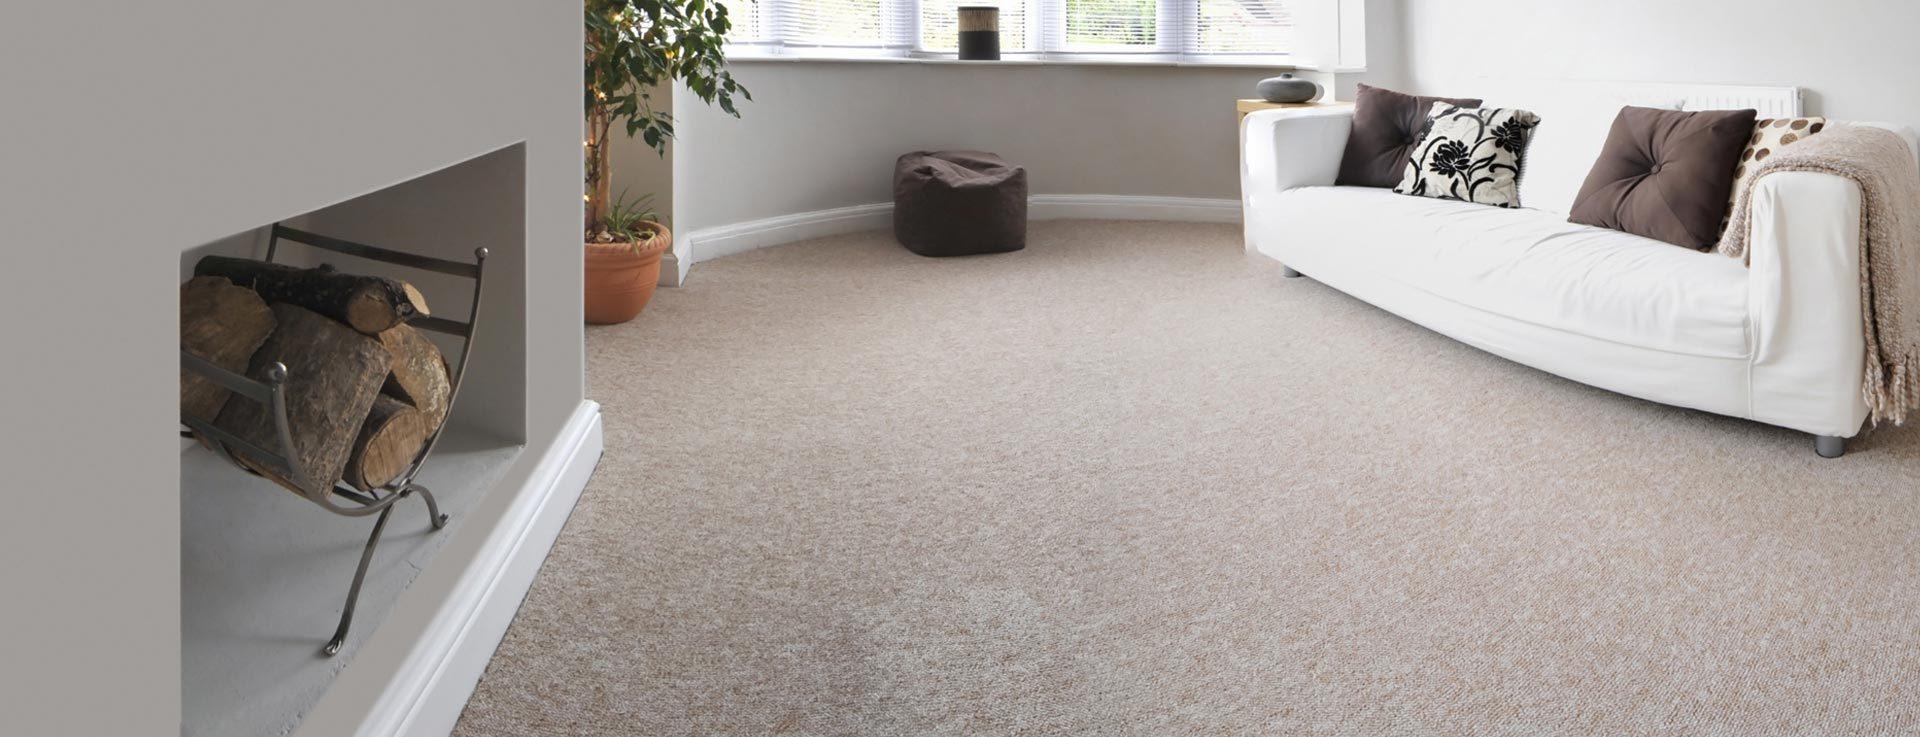 sofa-cleaning-basingstoke